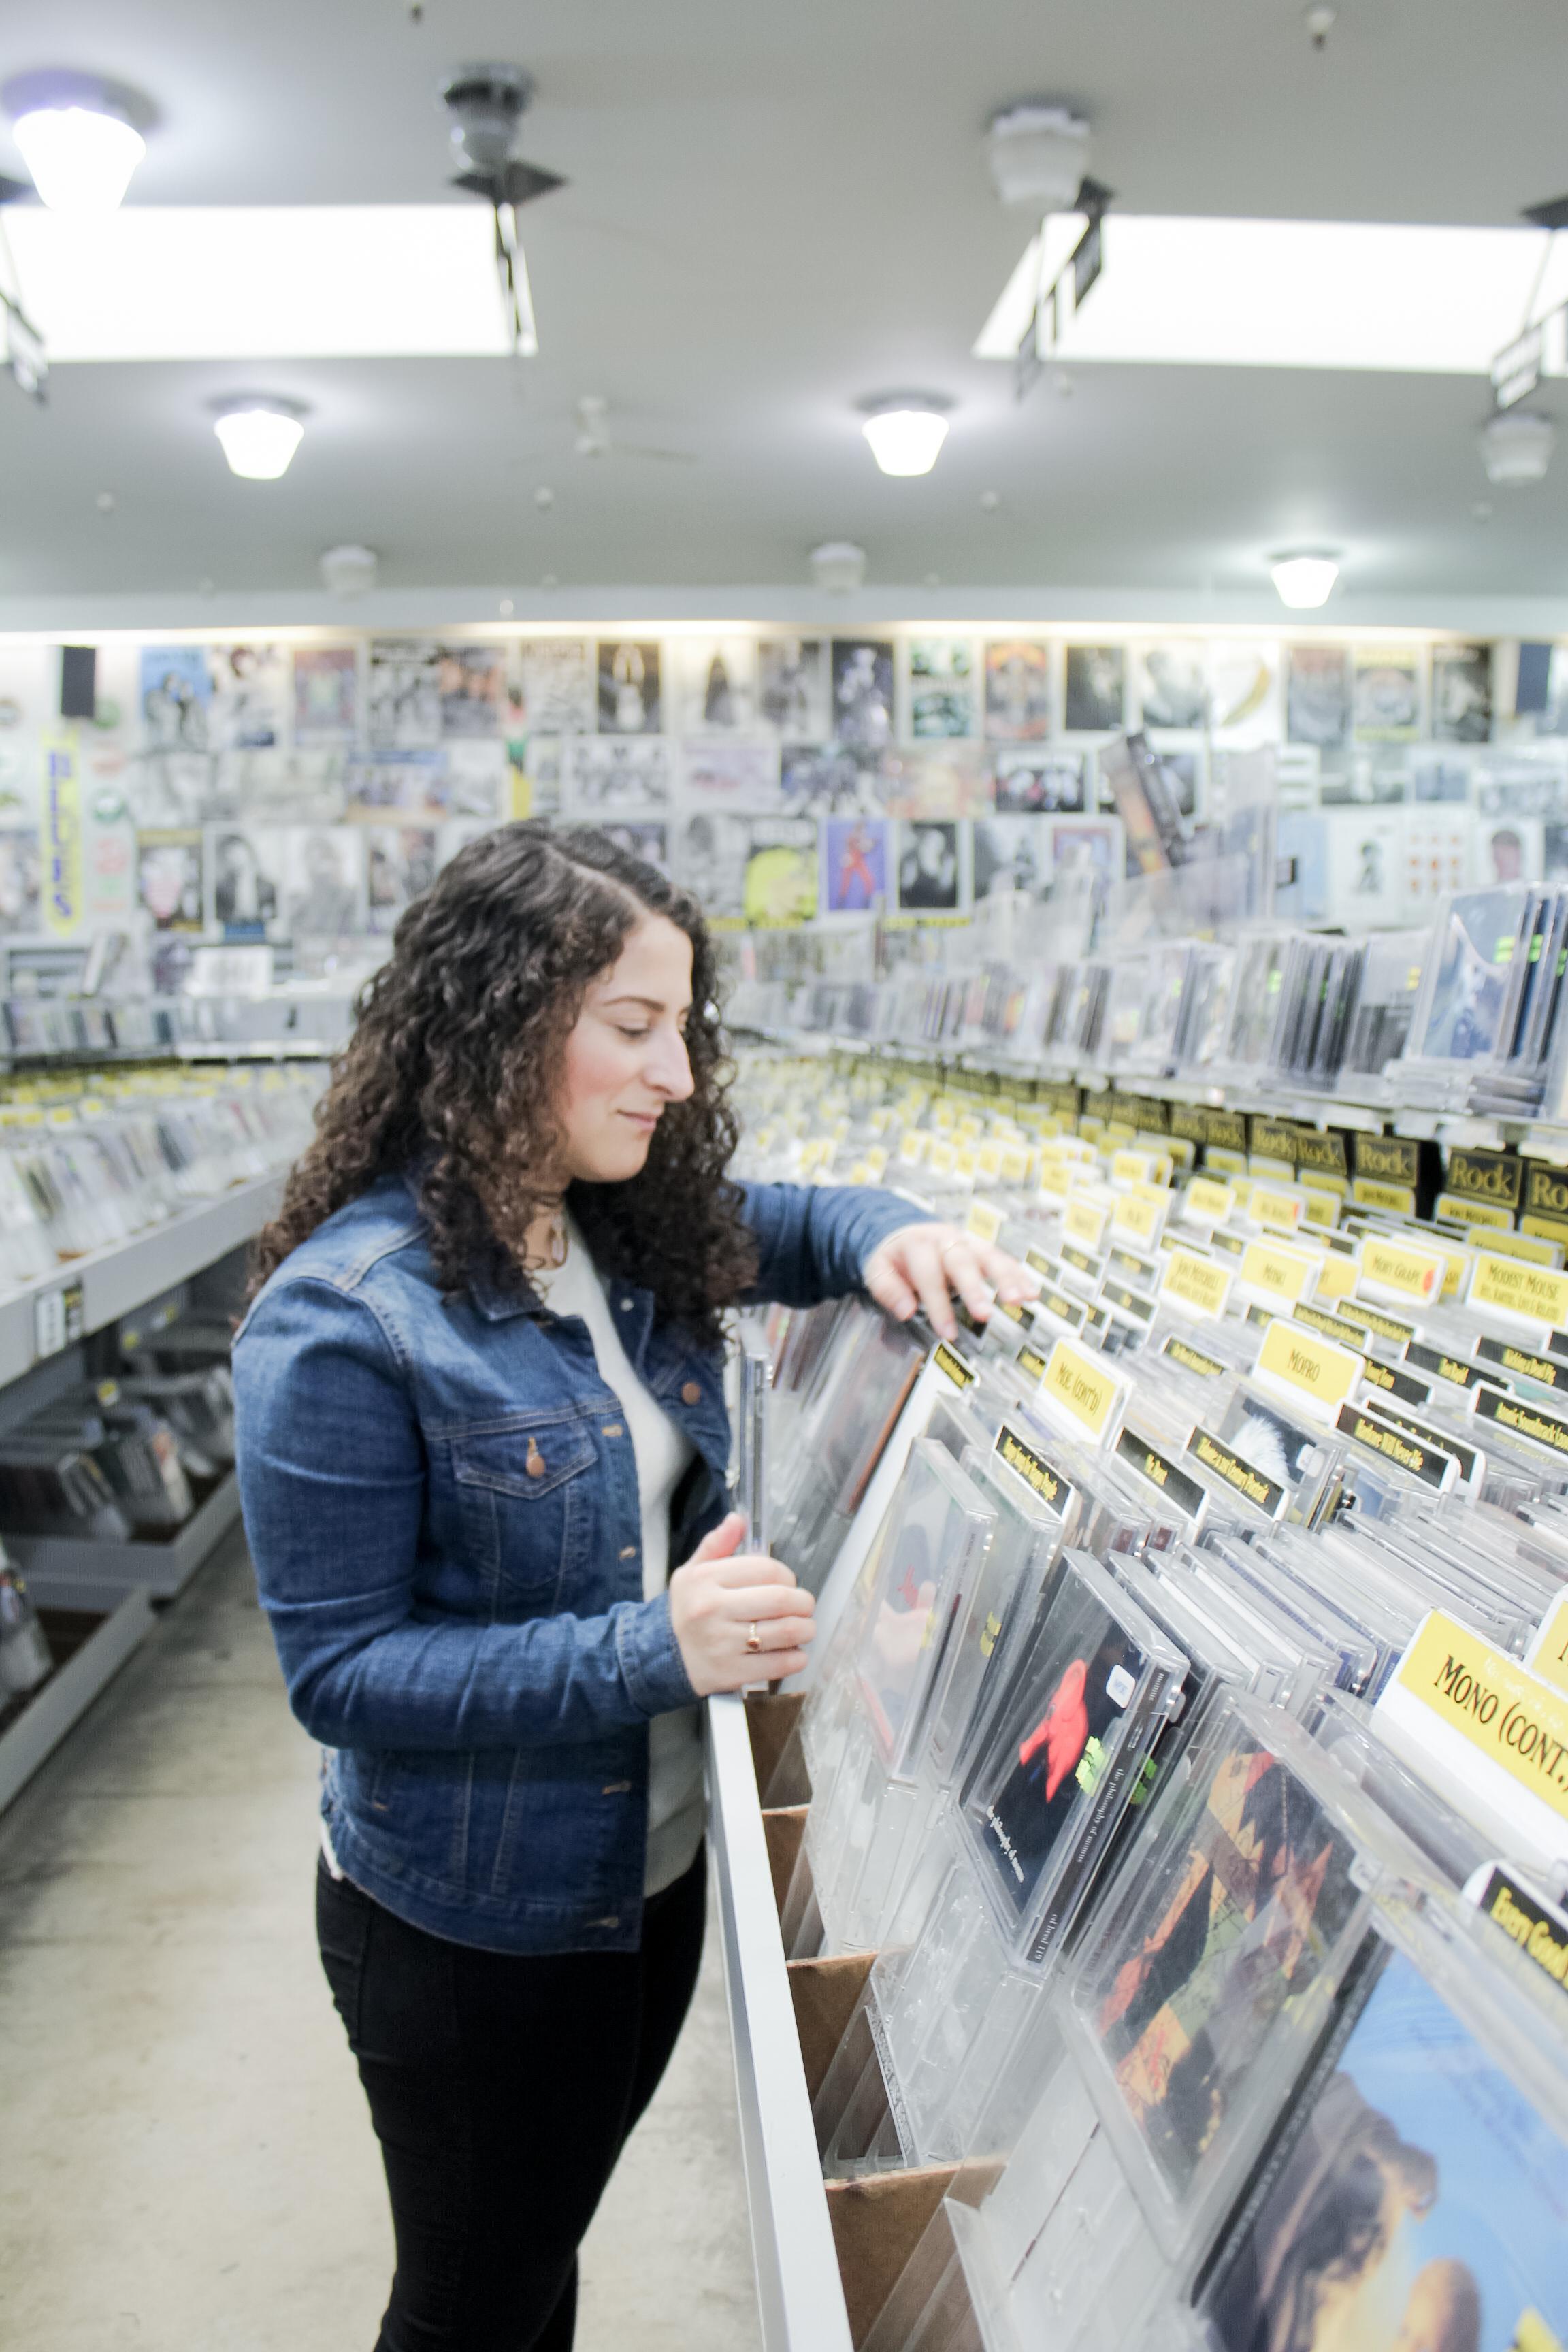 Amoeba Music Store in the Haight-Ashbury neighborhood of San Francisco | Tinted Green